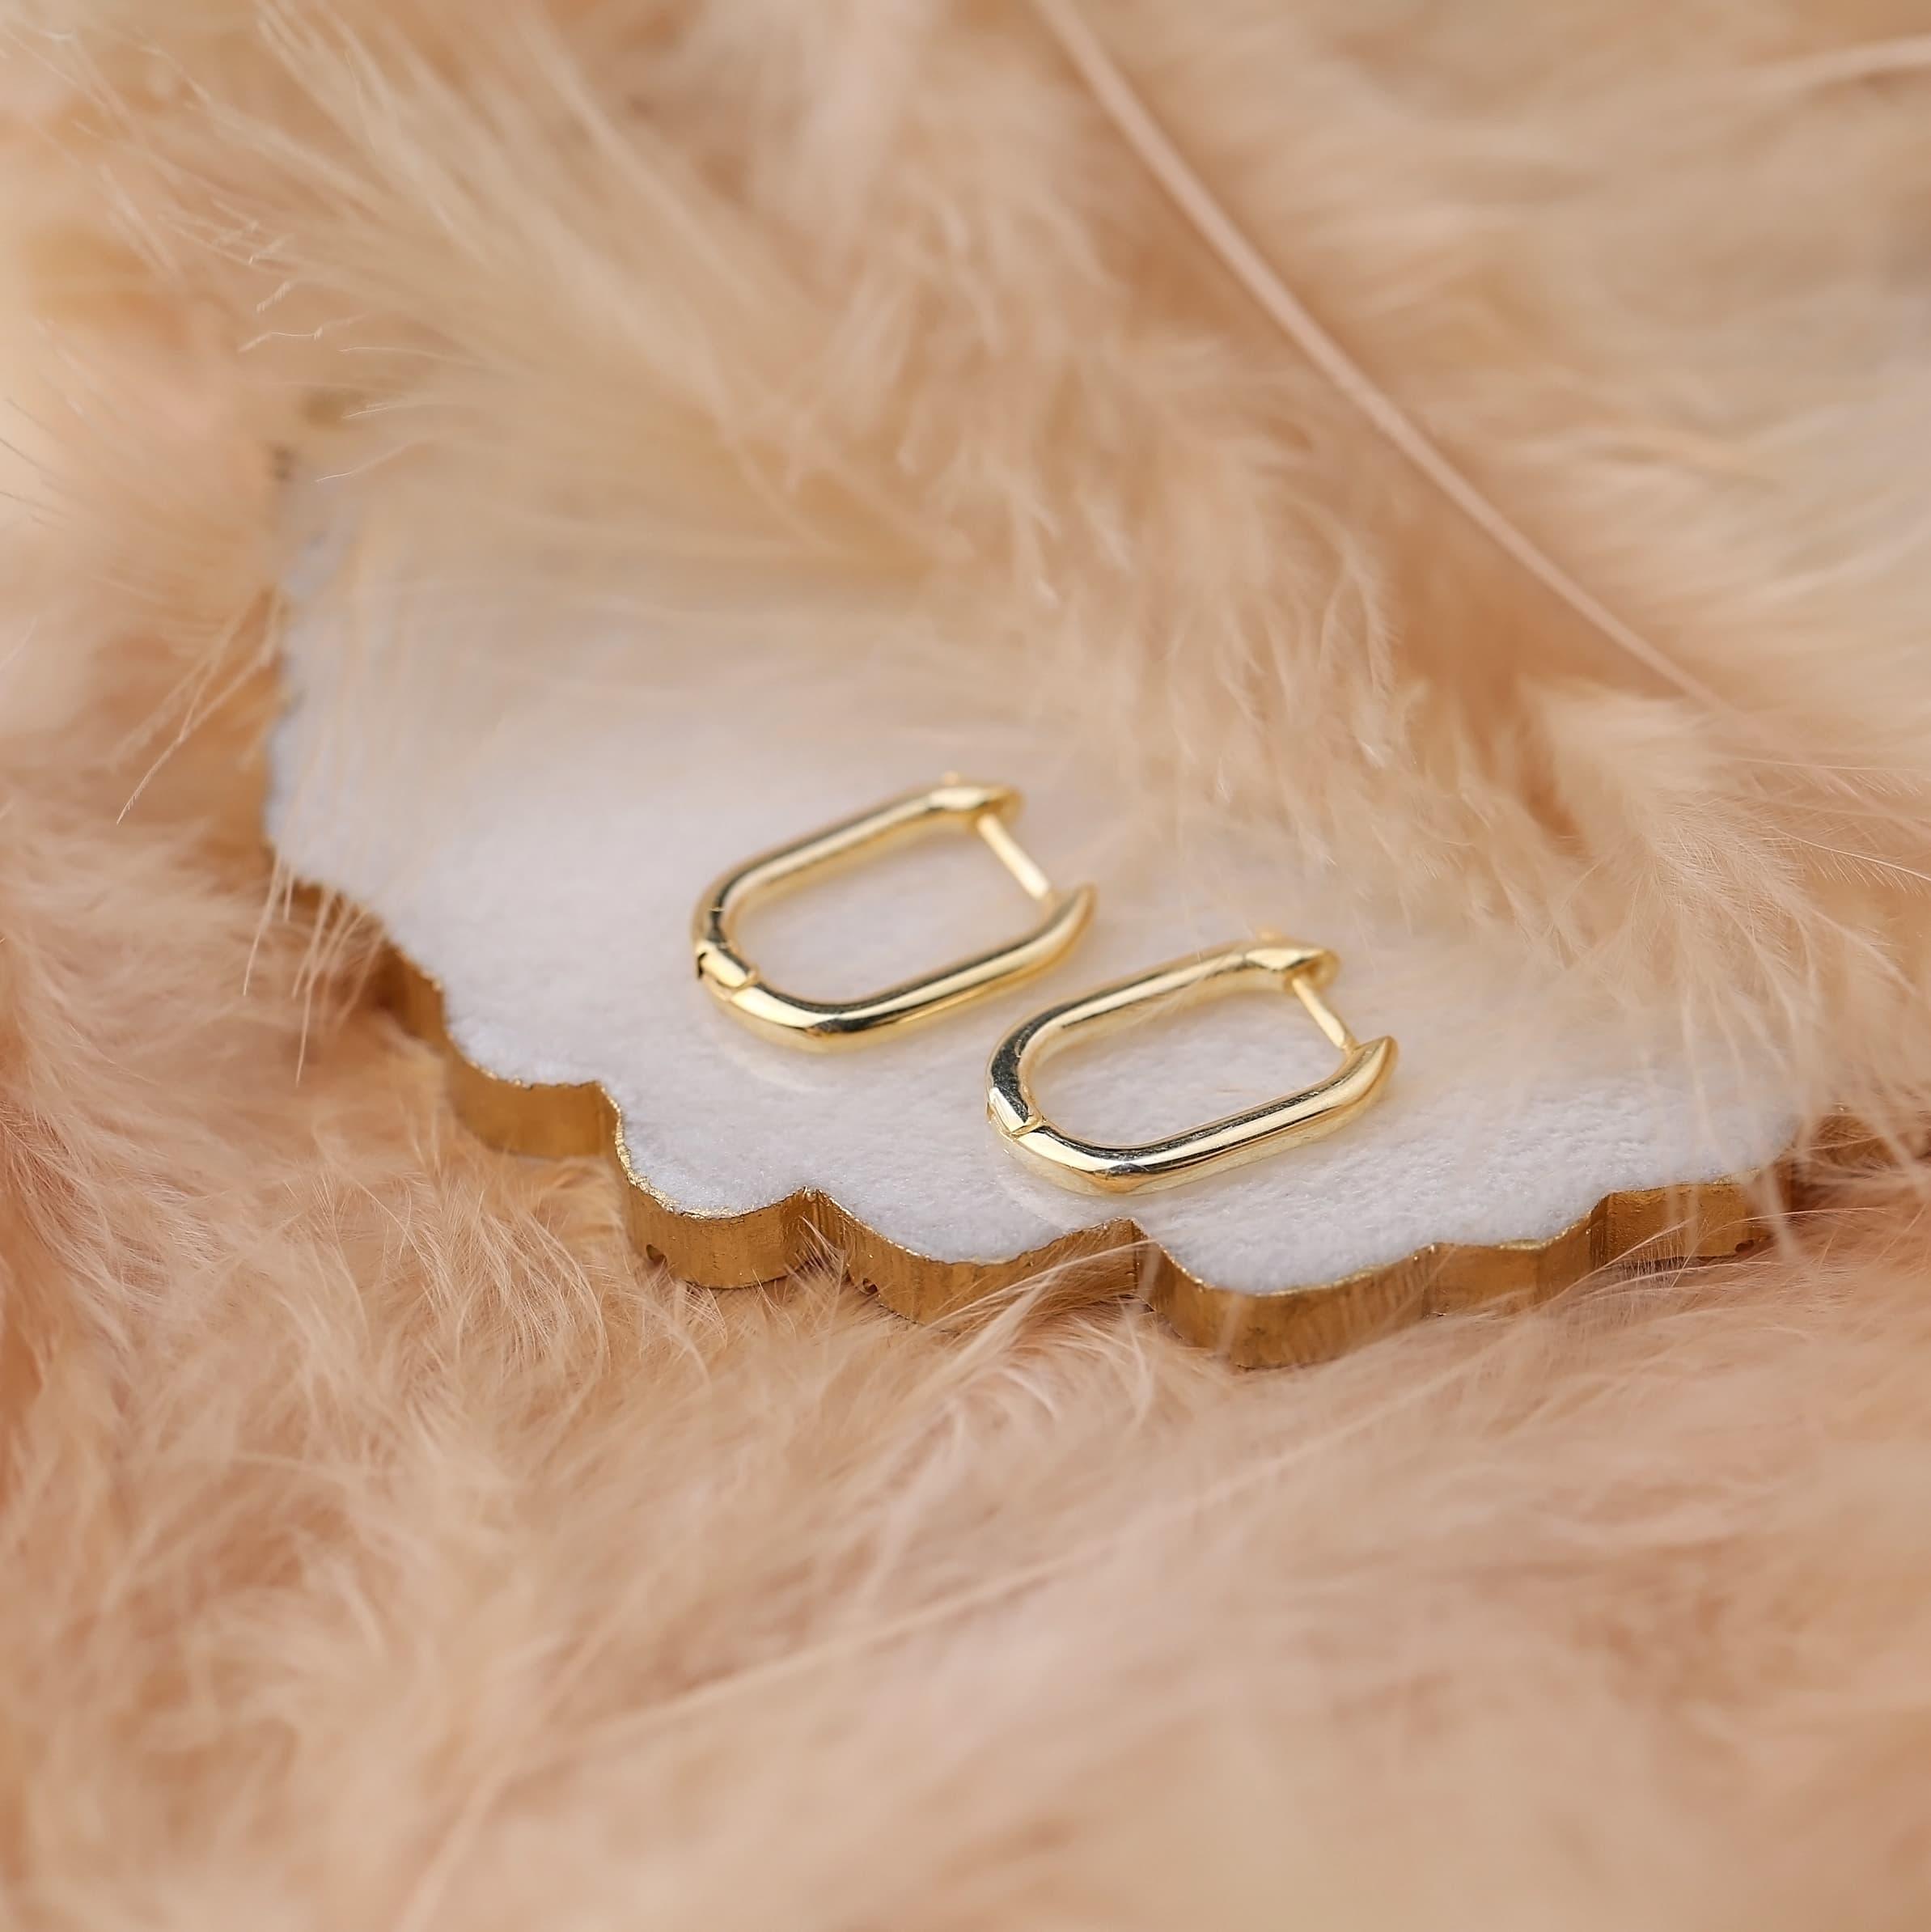 Silver Elegant Oval Hoop Earrings Wholesale Turkish Handmade 925 Sterling Silver Jewelry